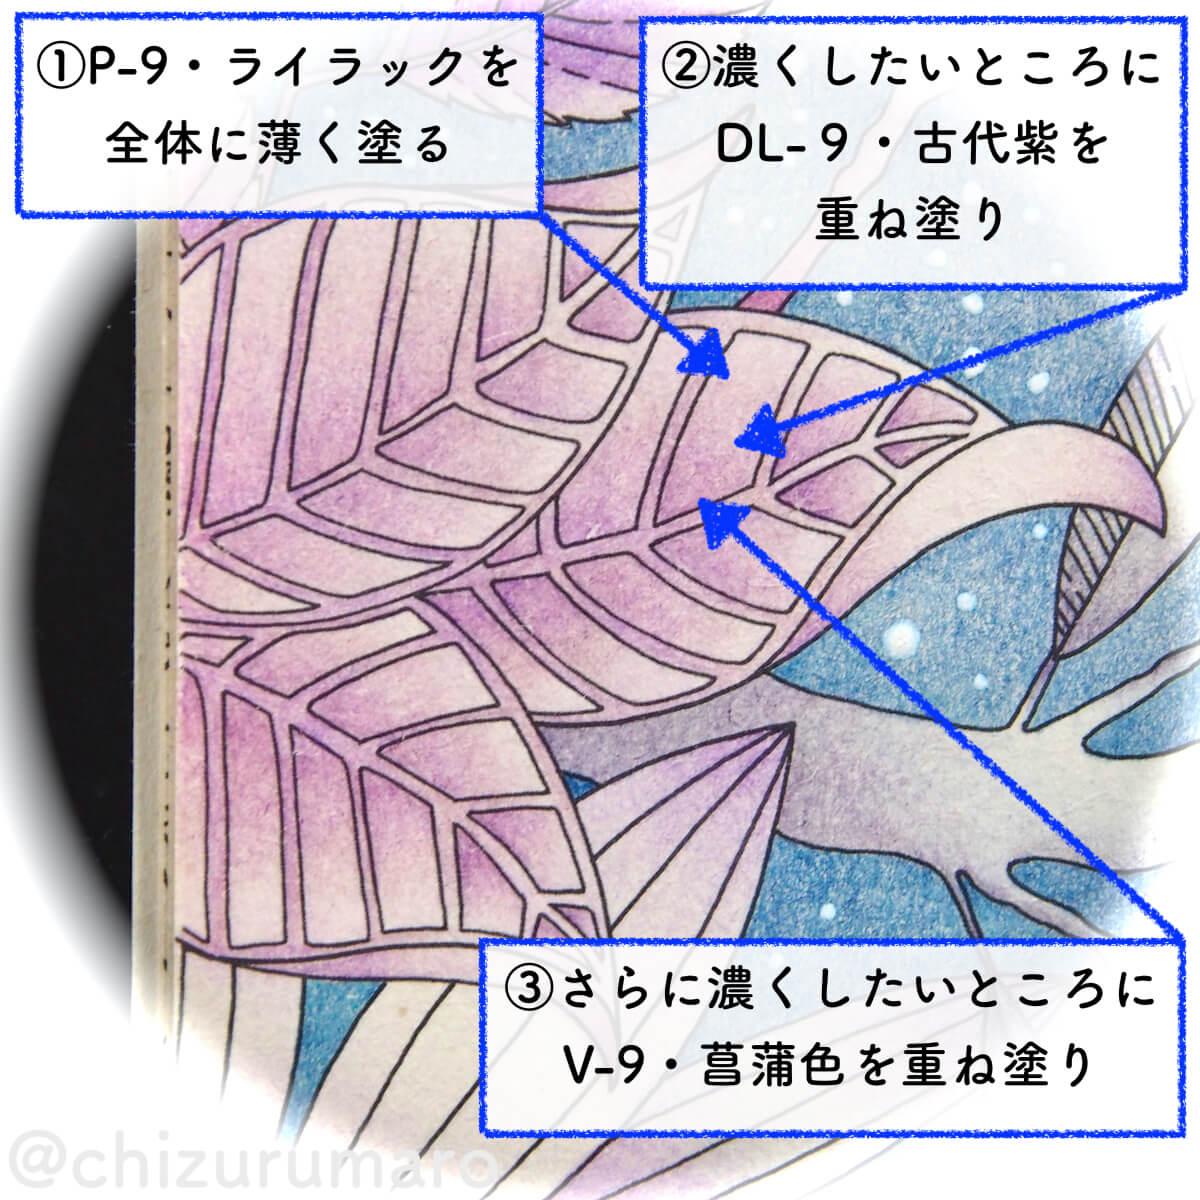 f:id:chizurumaro:20200513133636j:plain